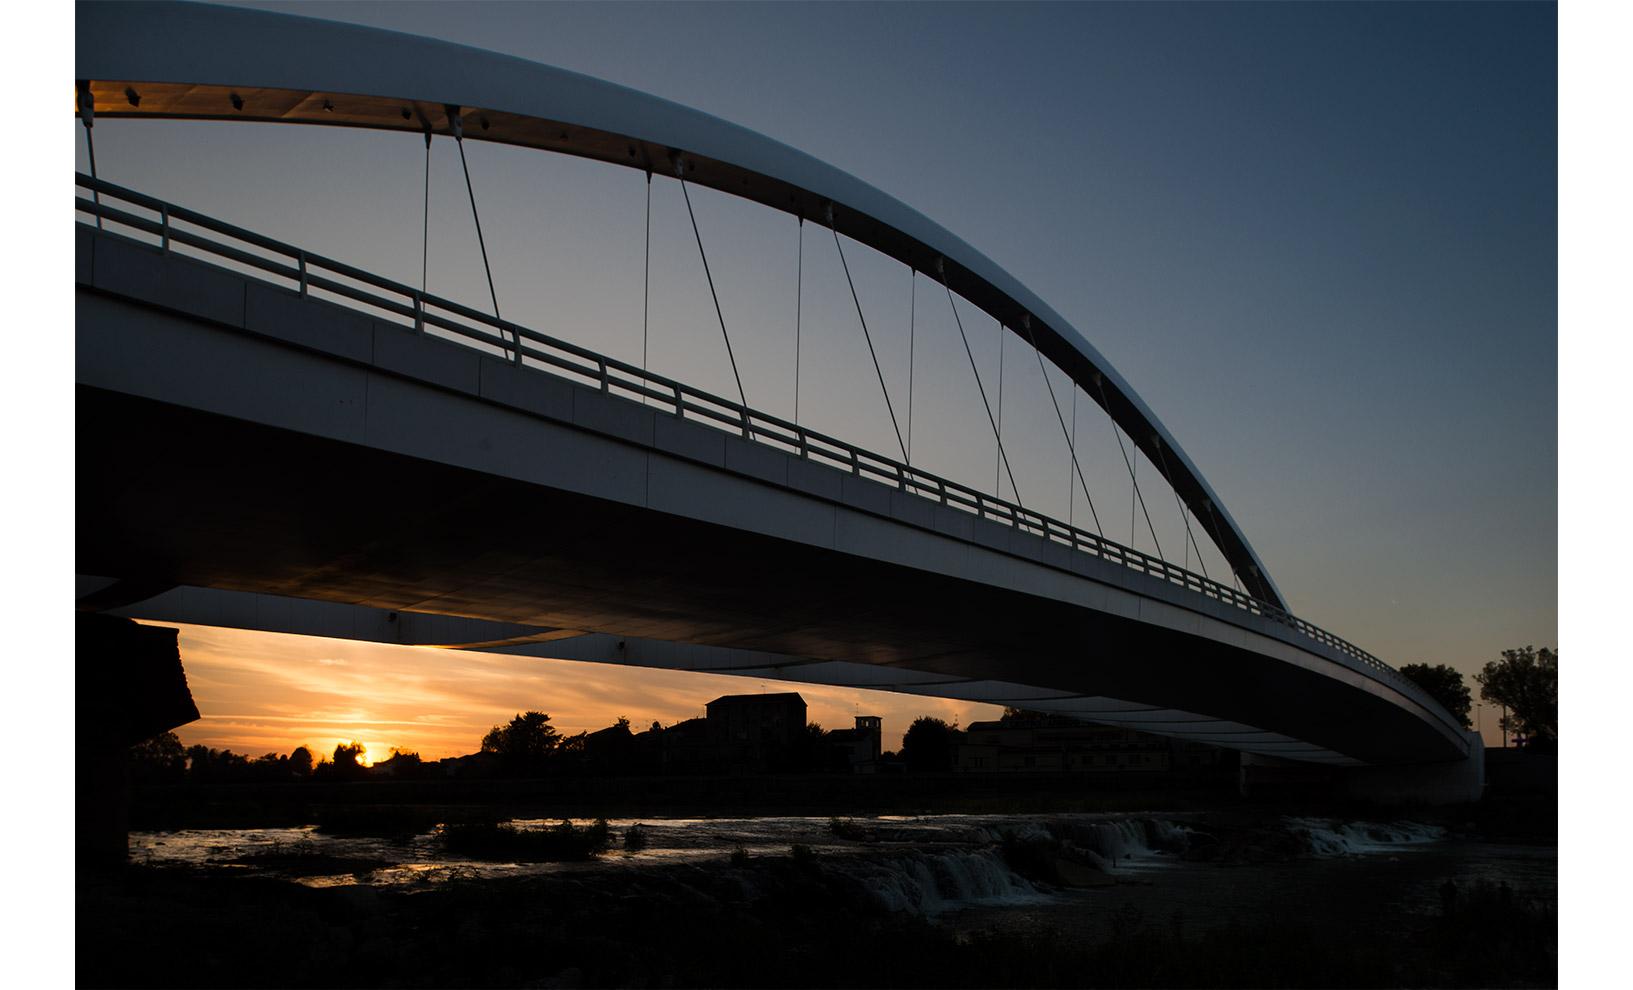 ©marco-tacchini-fotografo-ponte-cittadella-richar-meier-and-partners_21